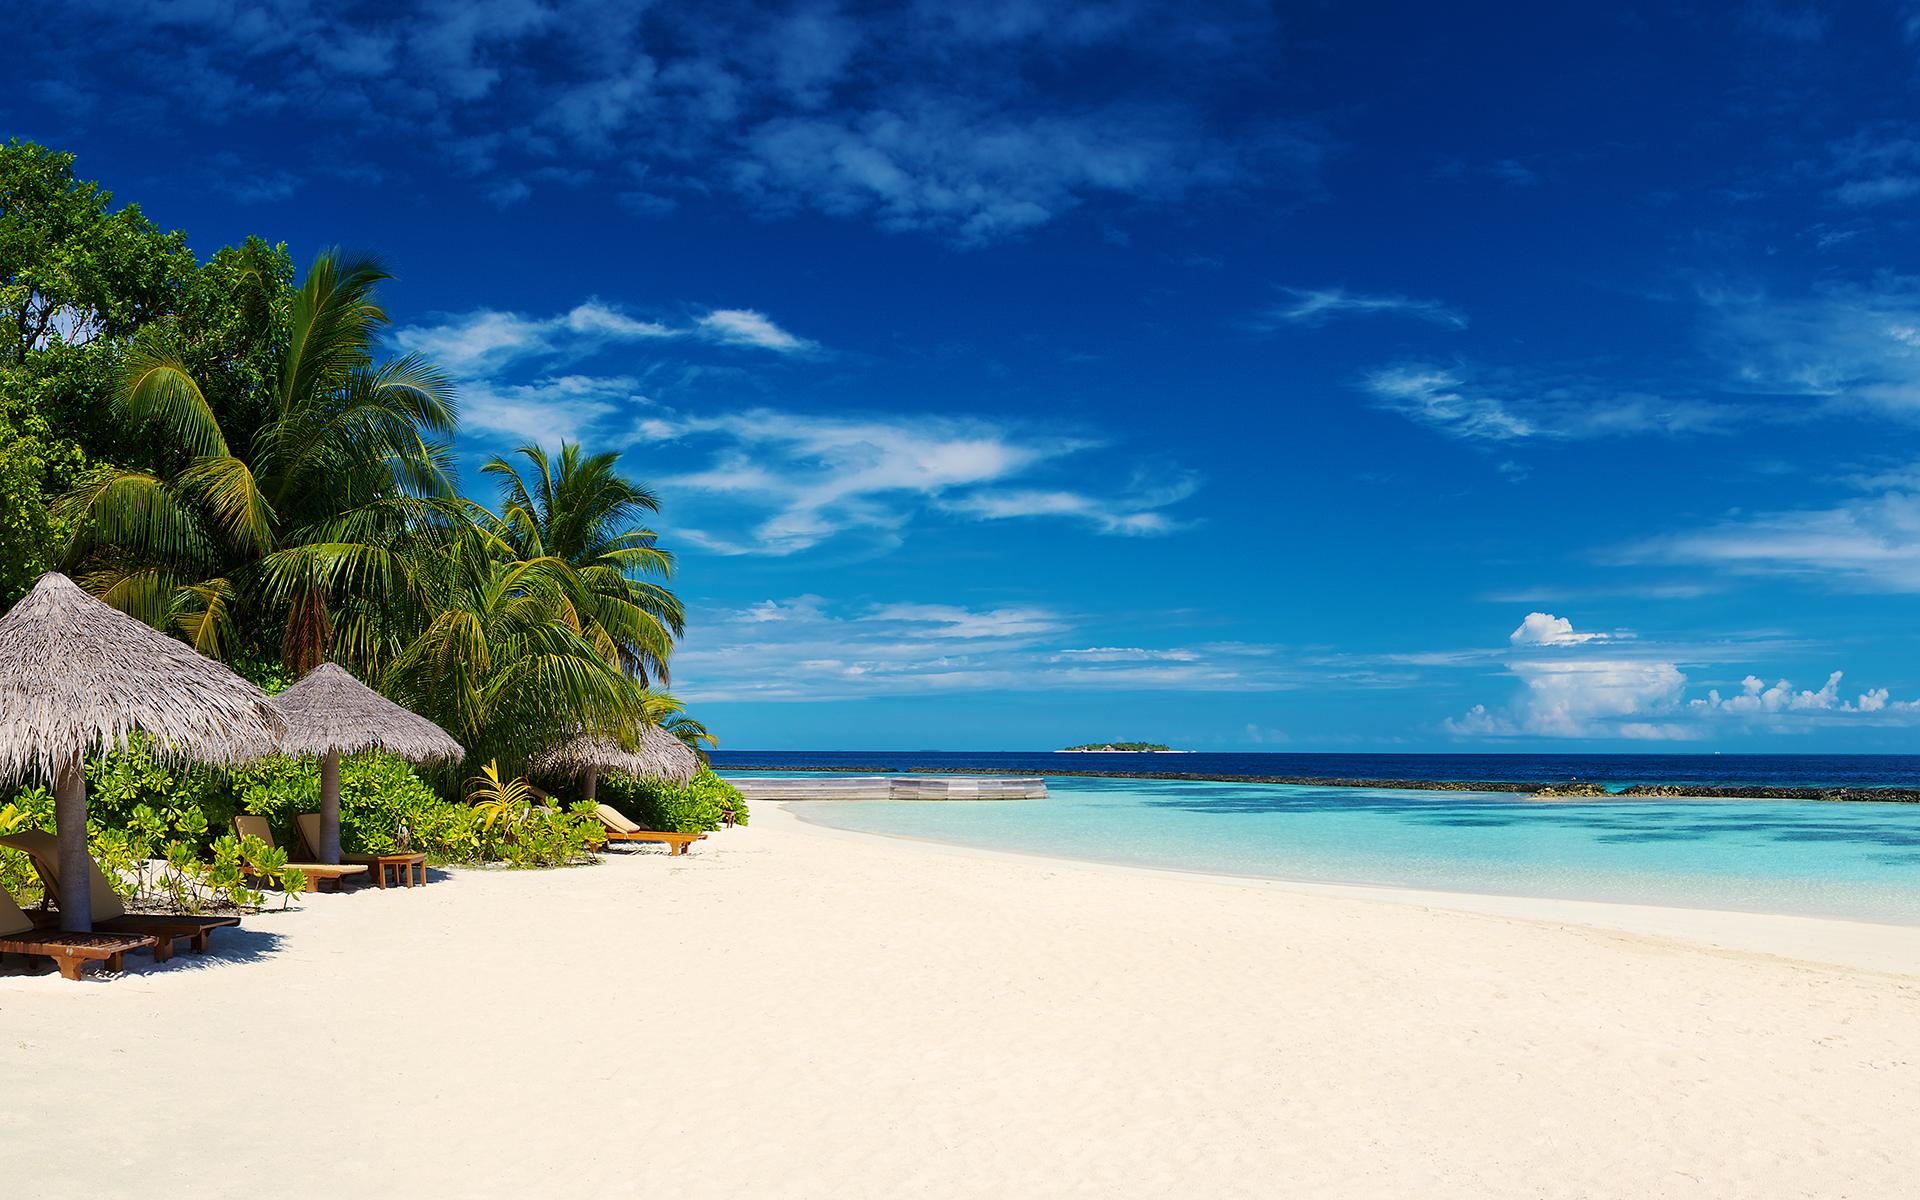 Baros Maldives By Dan Grady Desktop Wallpaper